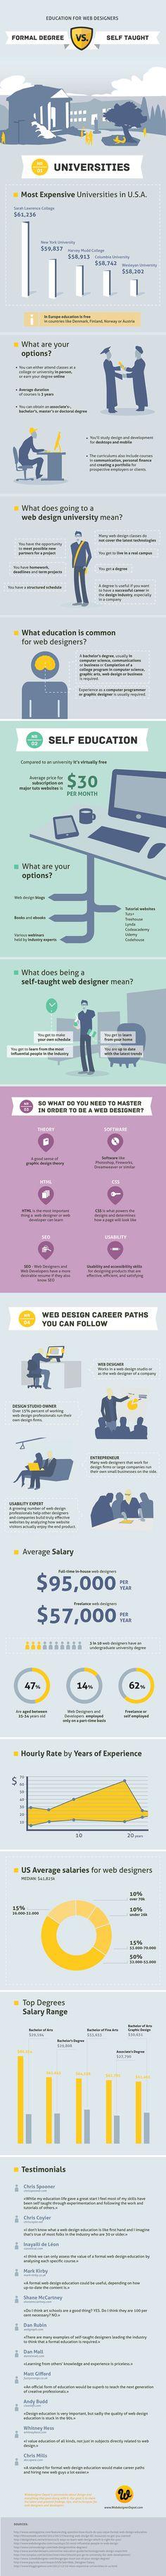 Diseñador web: ¿mejor estudiar carrera o ser autodidacta? #infografia #infographic #deasign